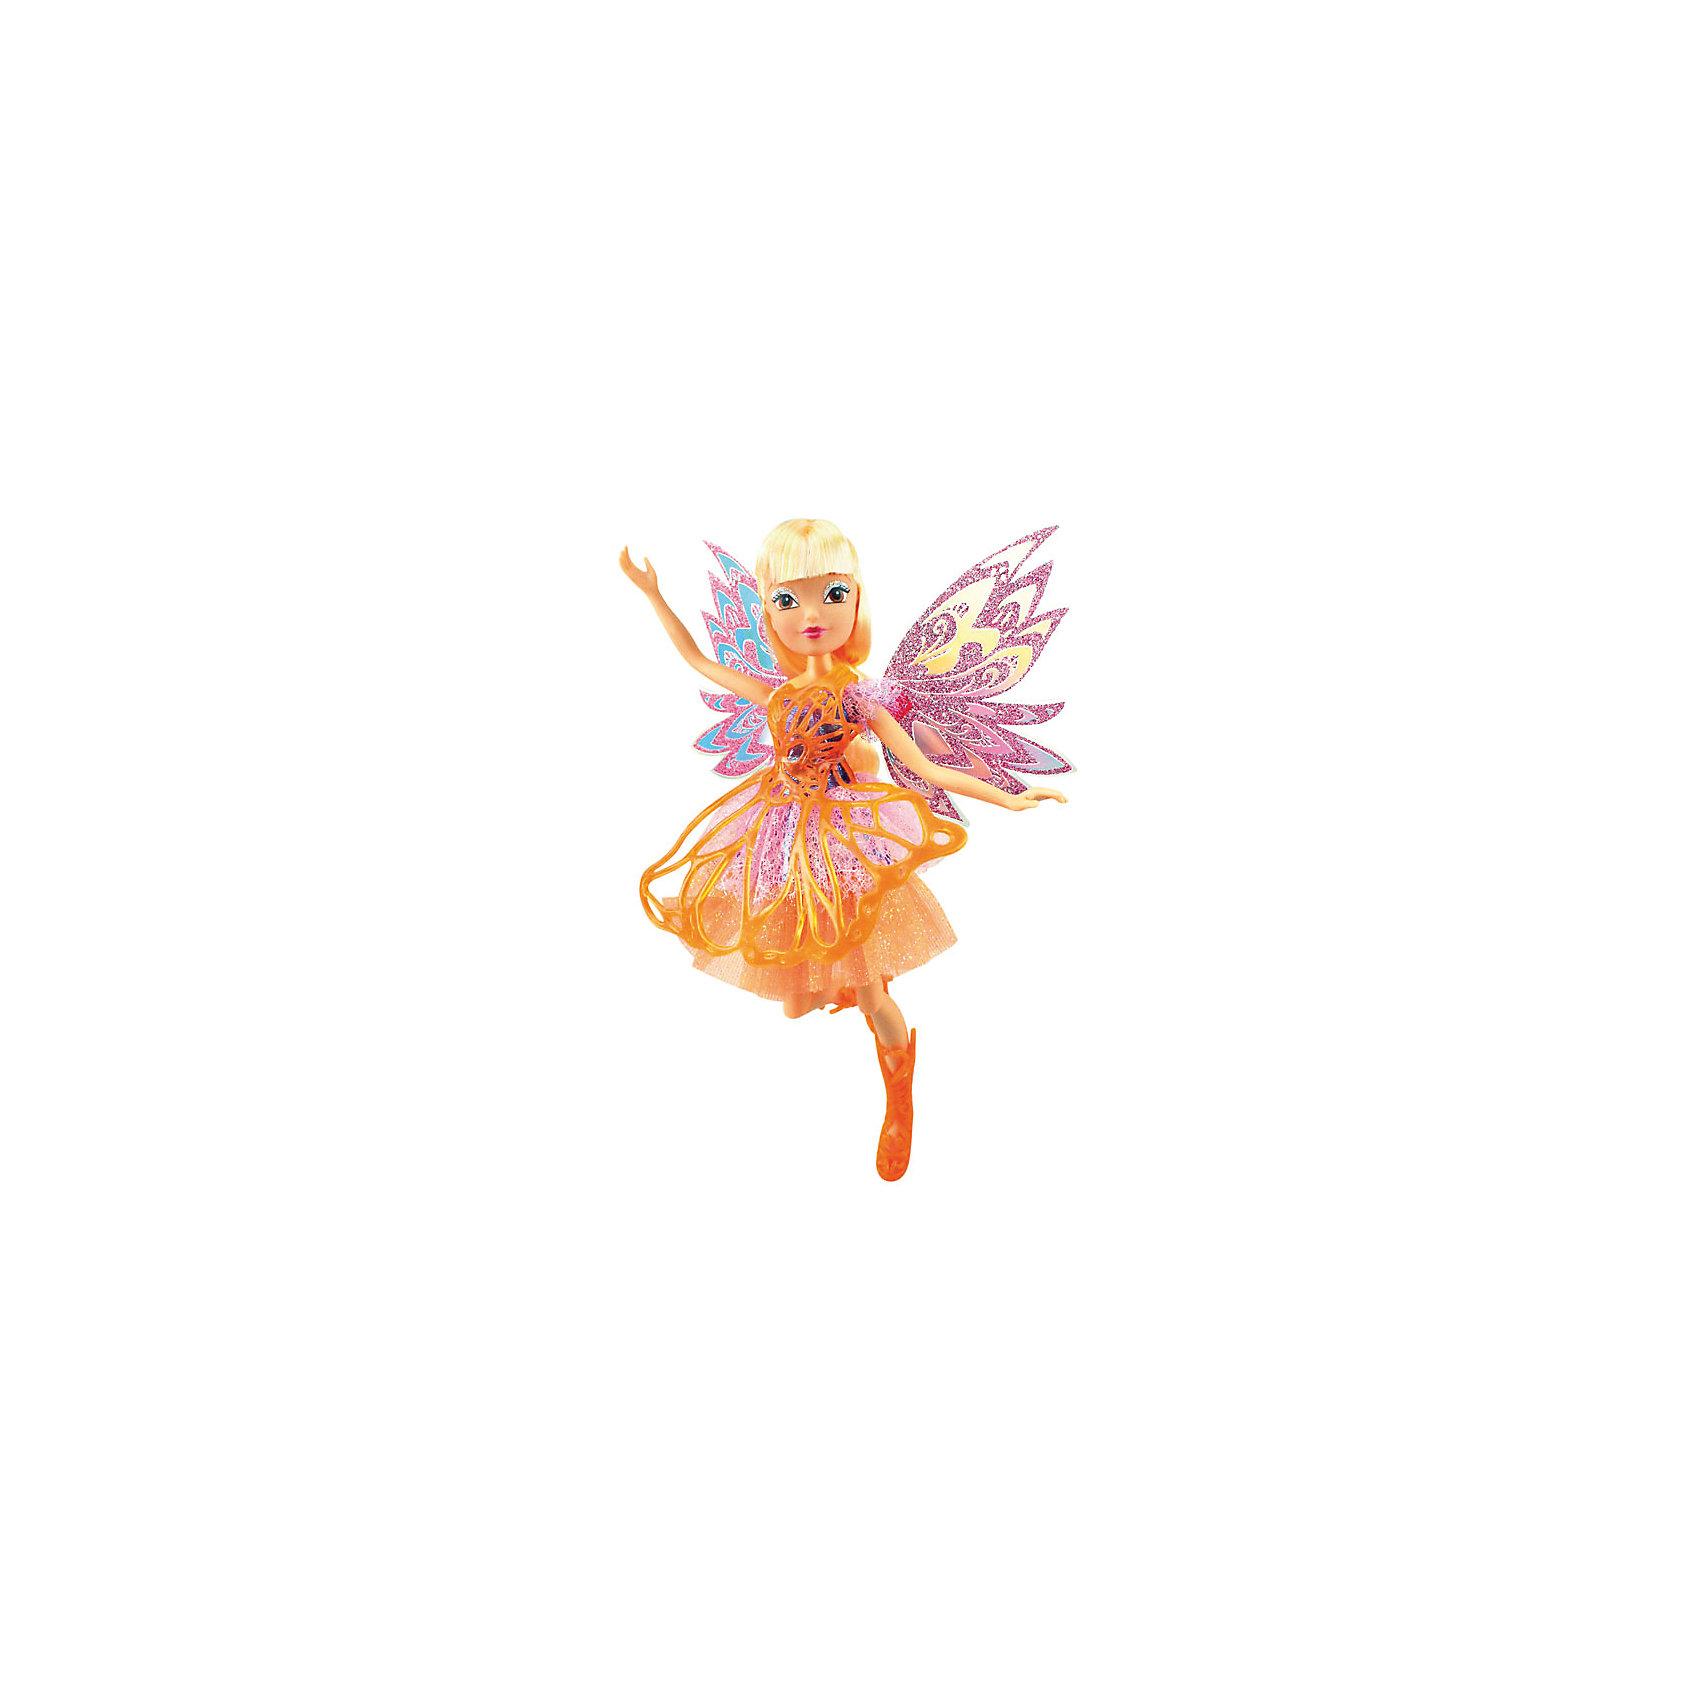 Gulliver Кукла Баттерфликс-2. Двойные крылья Flora, Winx Club gulliver игровой набор блум волшебный трон winx club